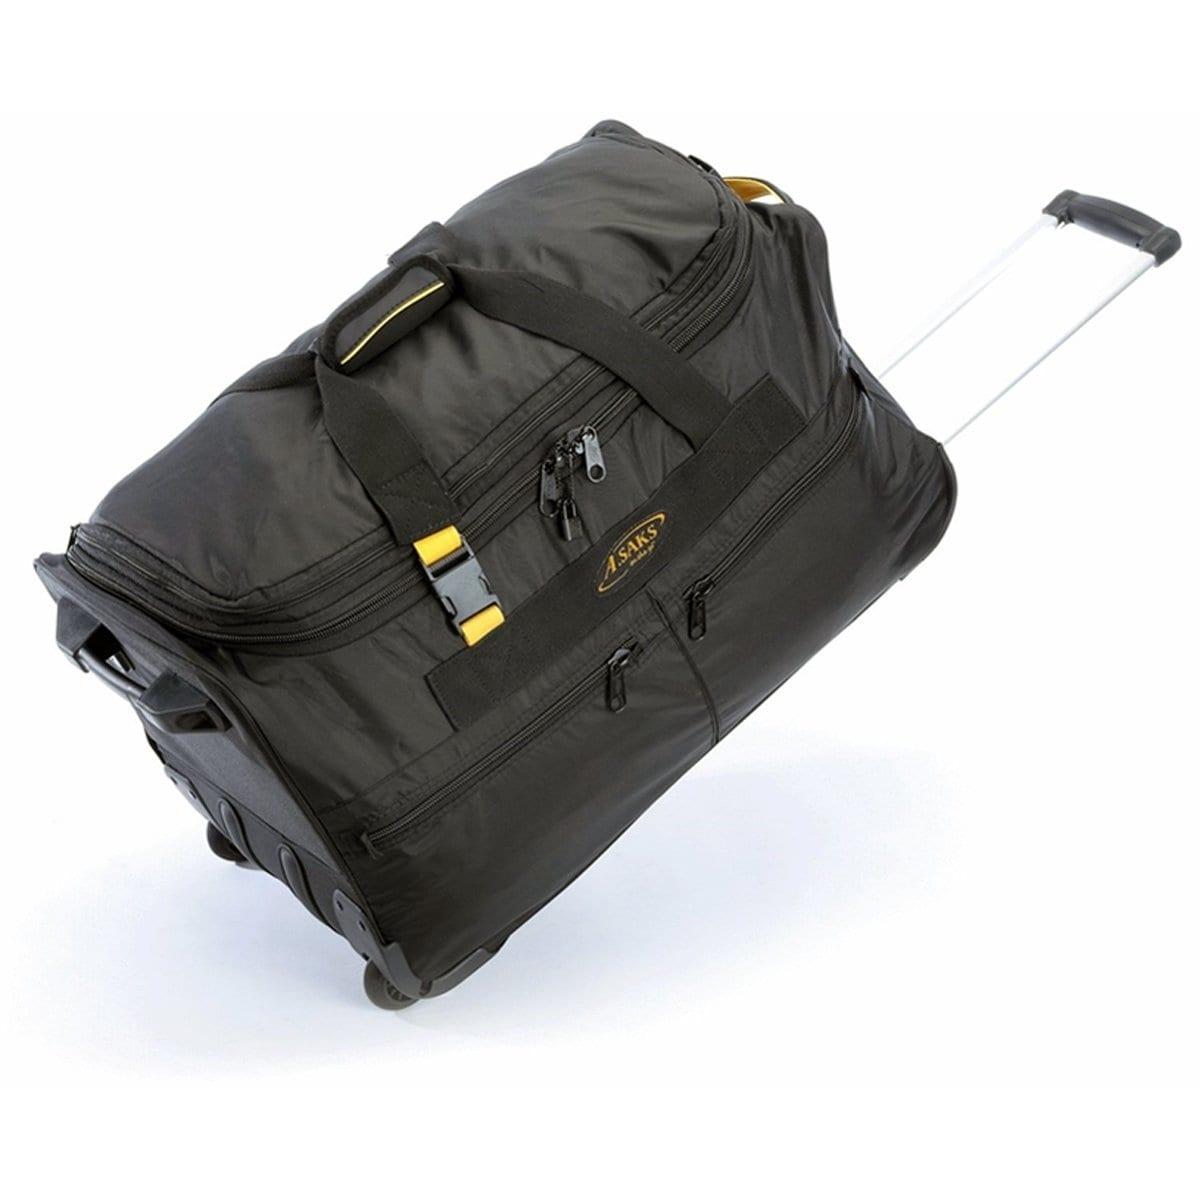 e32cf45a80 Shop A.Saks 25-inch Expandable Wheeled Upright Duffel Bag - On Sale ...